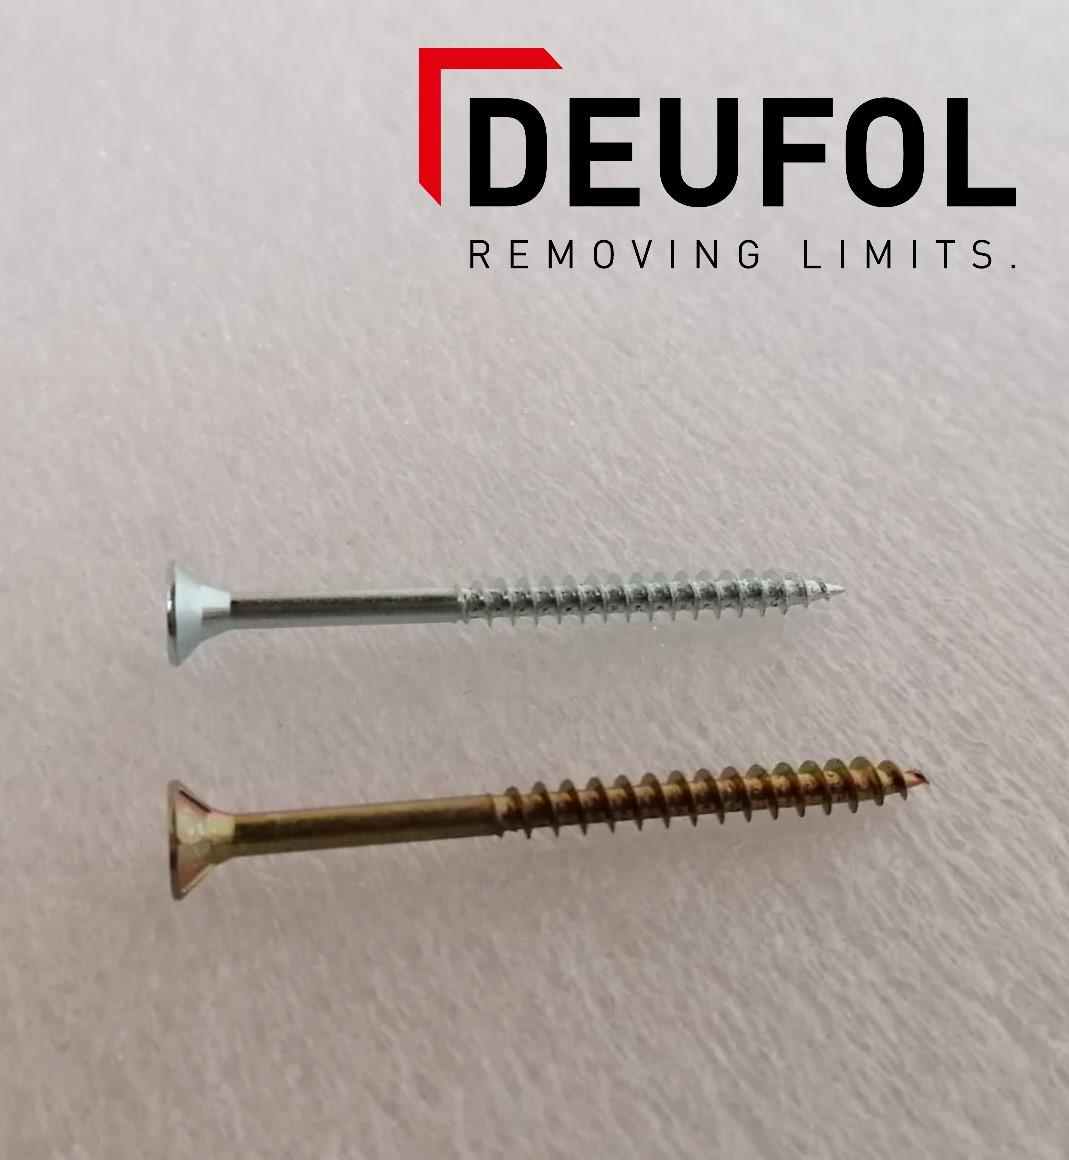 Wood screw 4,5x60mm TX25 zinc plated - 200 pieces